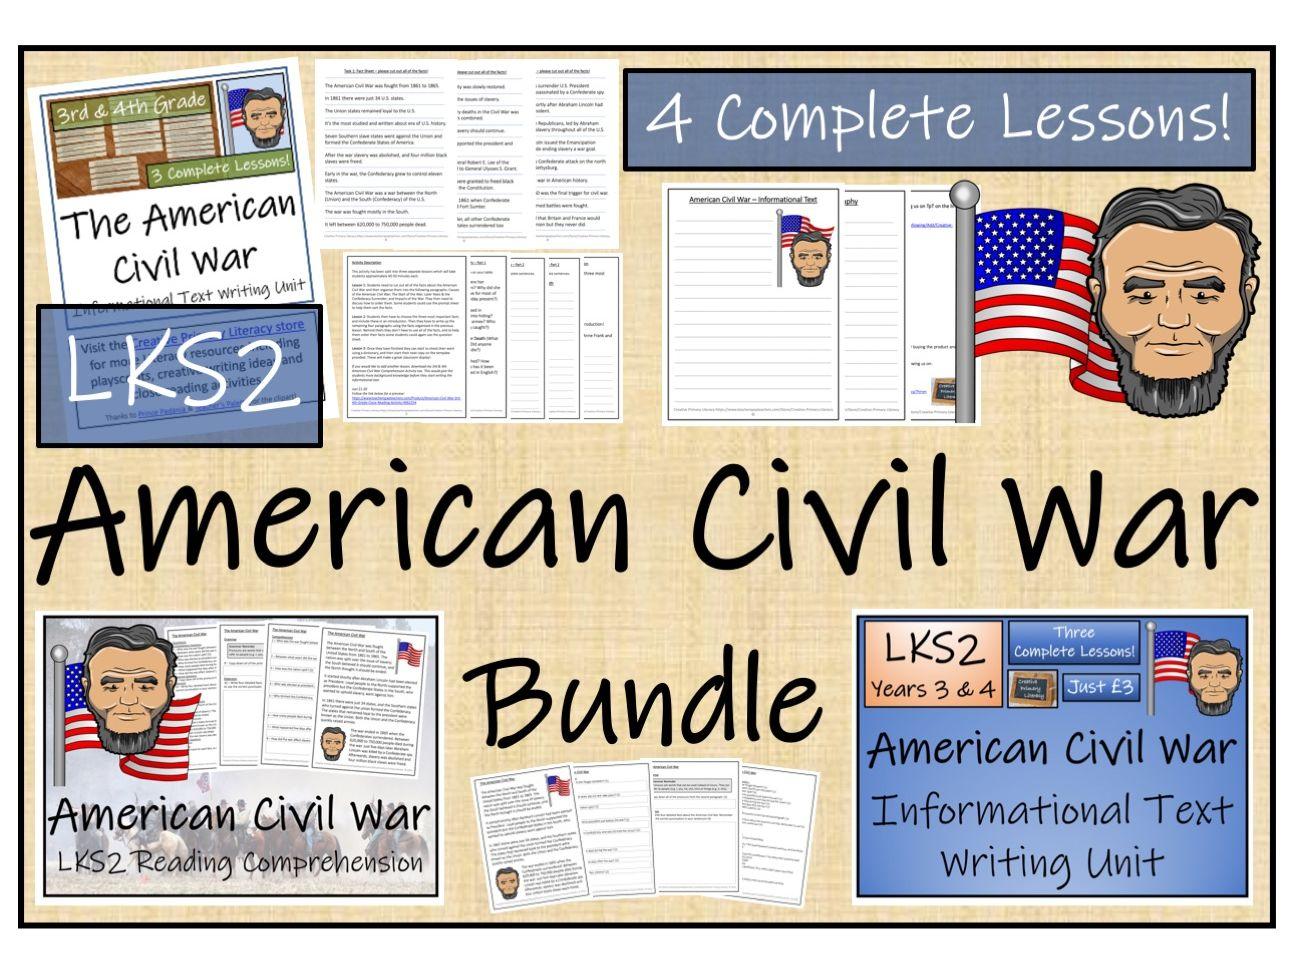 LKS2 History - American Civil War Reading Comprehension & Informational Text Writing Bundle